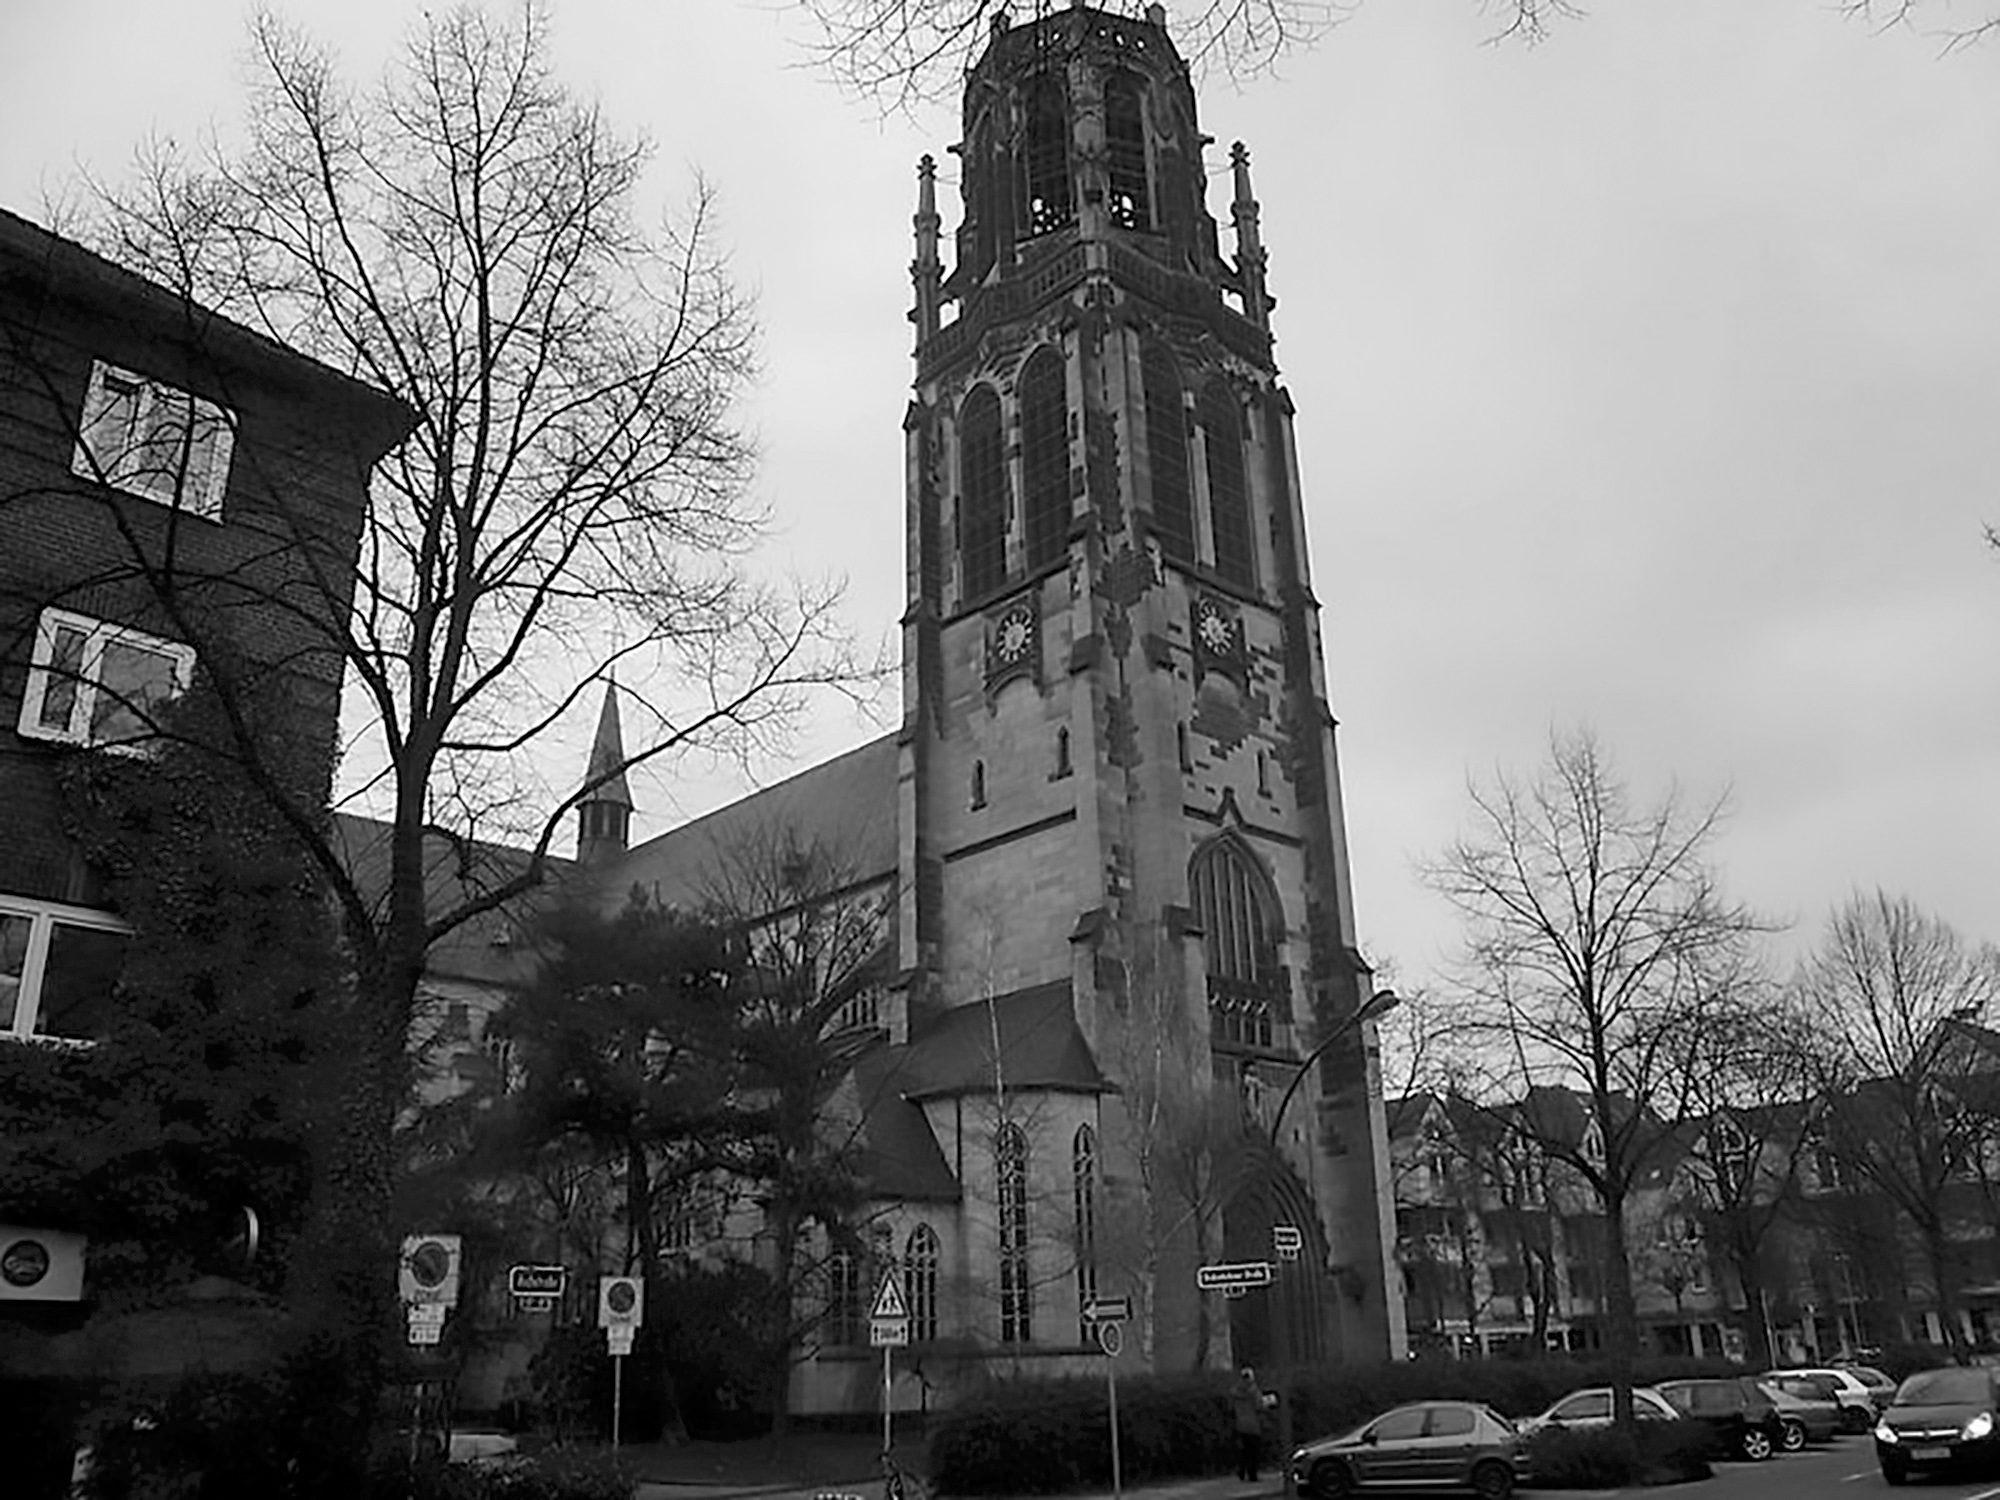 Sad Spireless German Church Gets Futuristic LED Roof